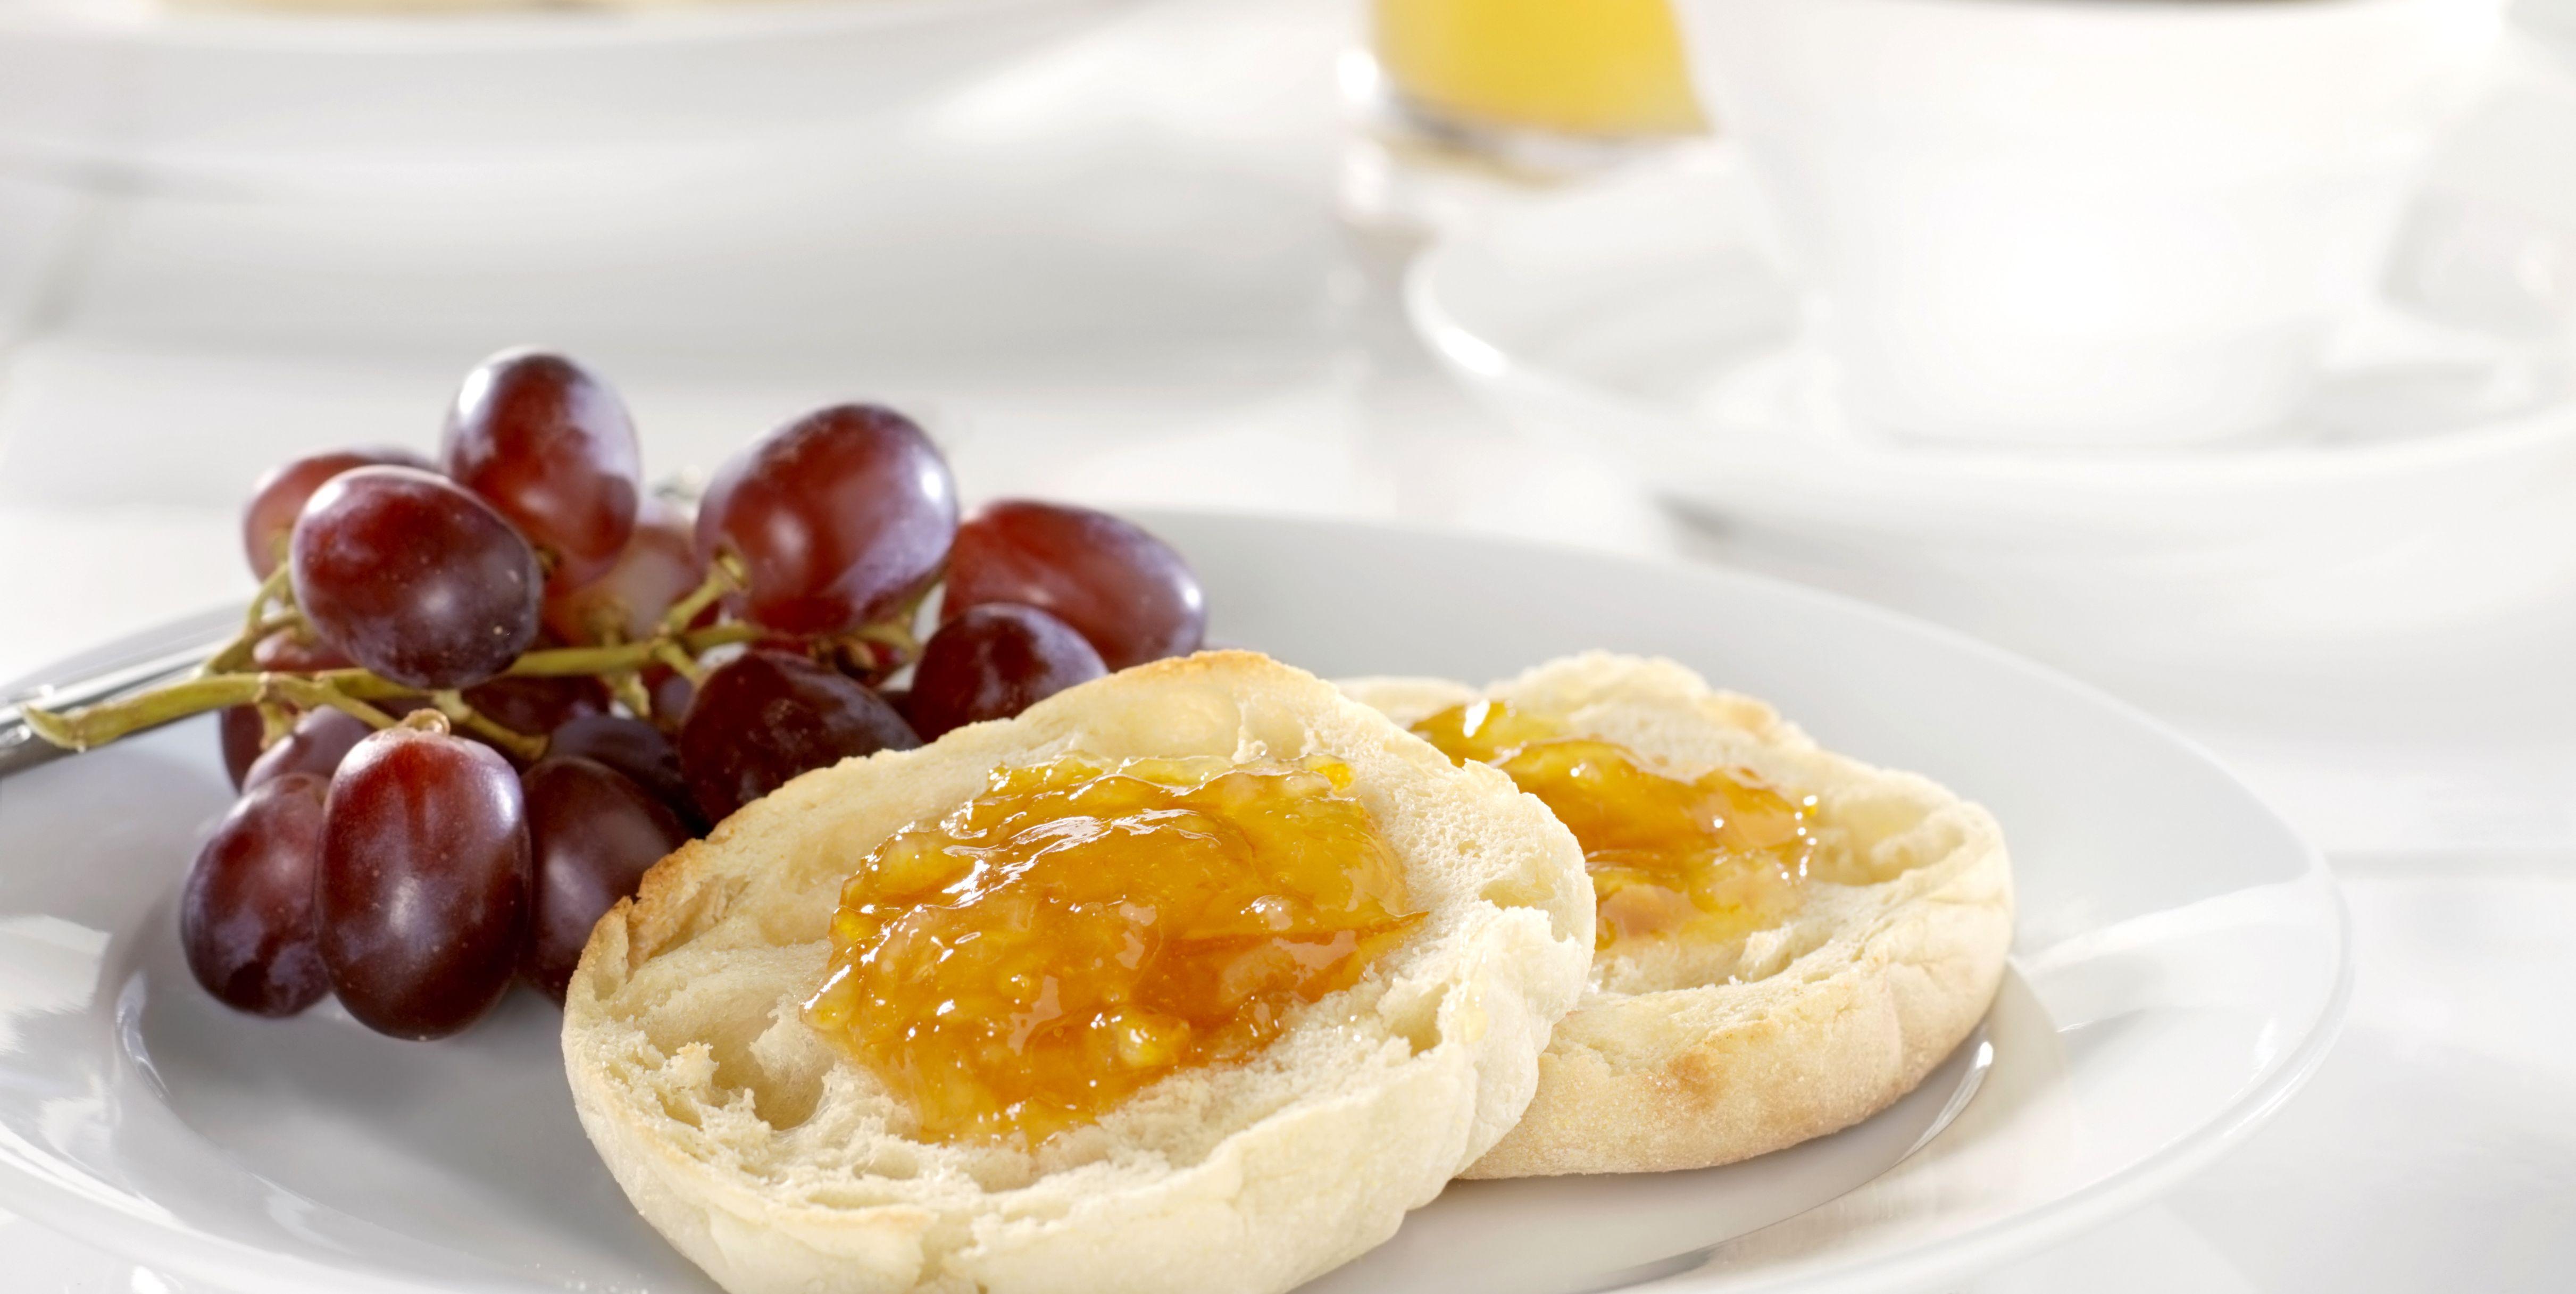 Toasted English Muffin with Orange Marmalade